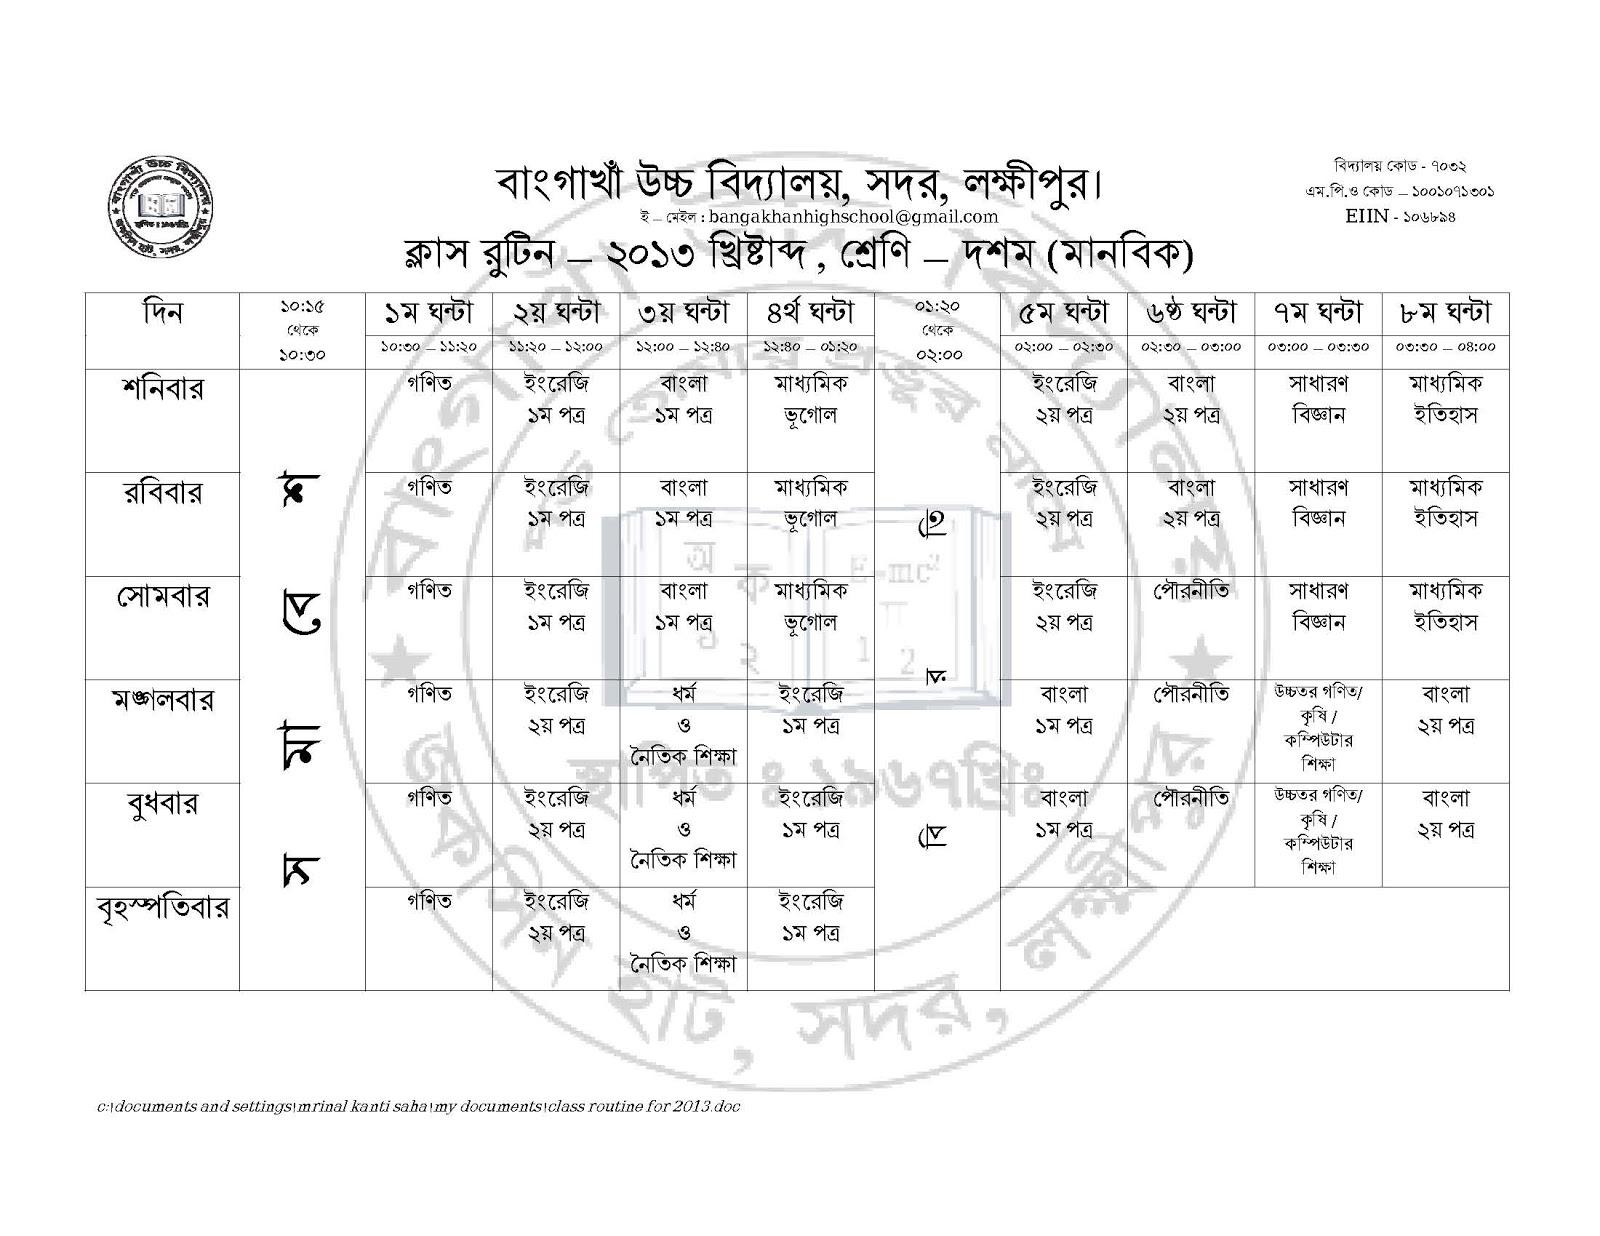 bangakhan high school class routine for 2013 six to ten